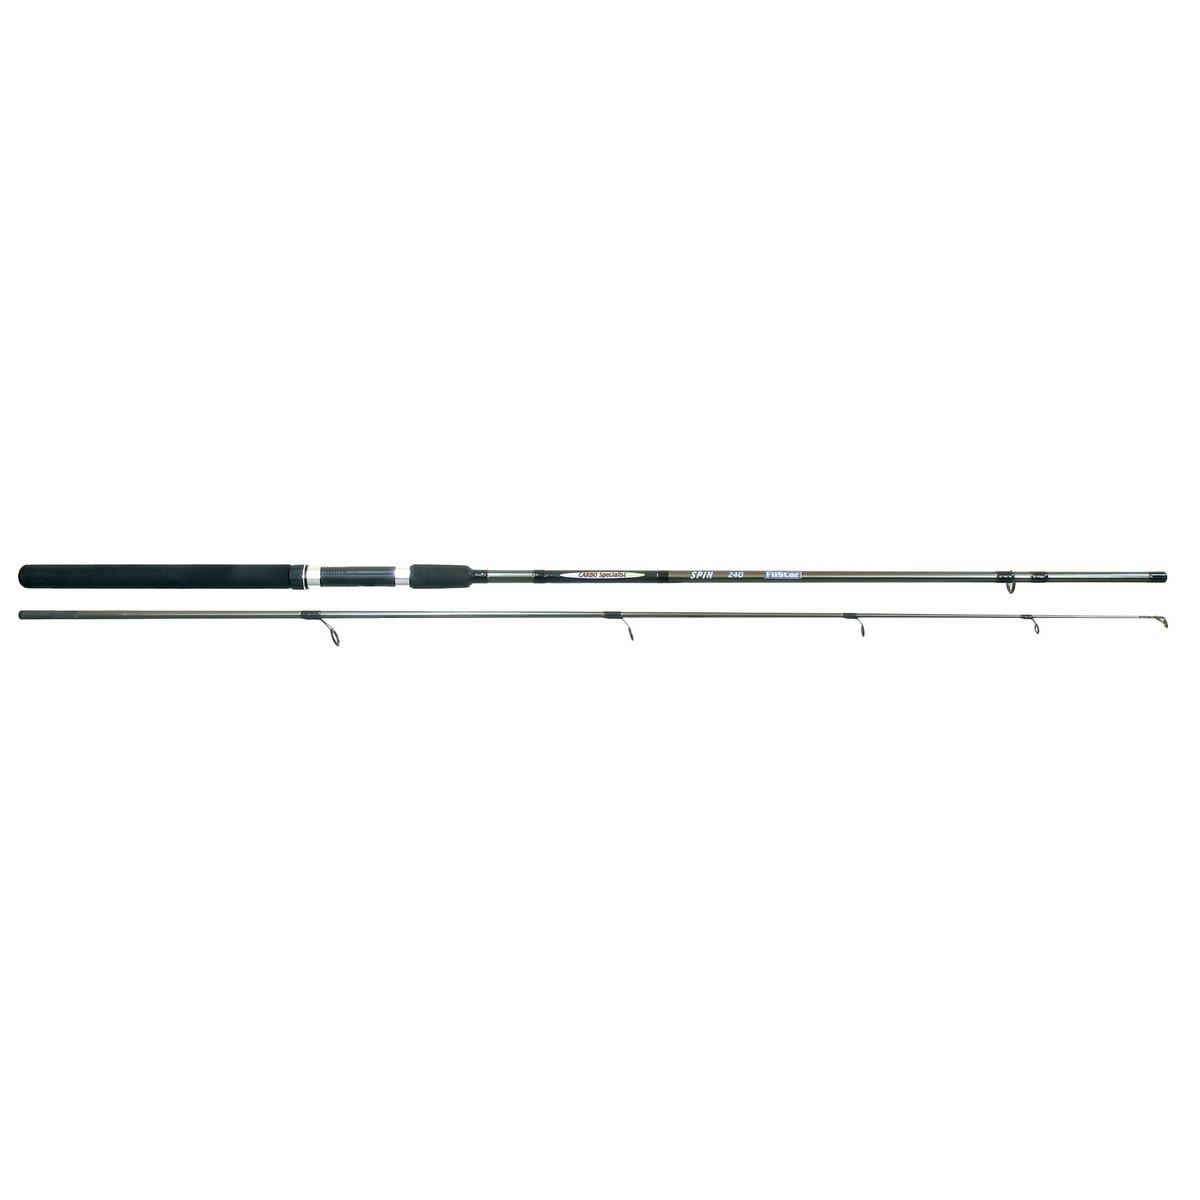 Риболовен прът Filstar Carbo Specialst Spin 2.70m